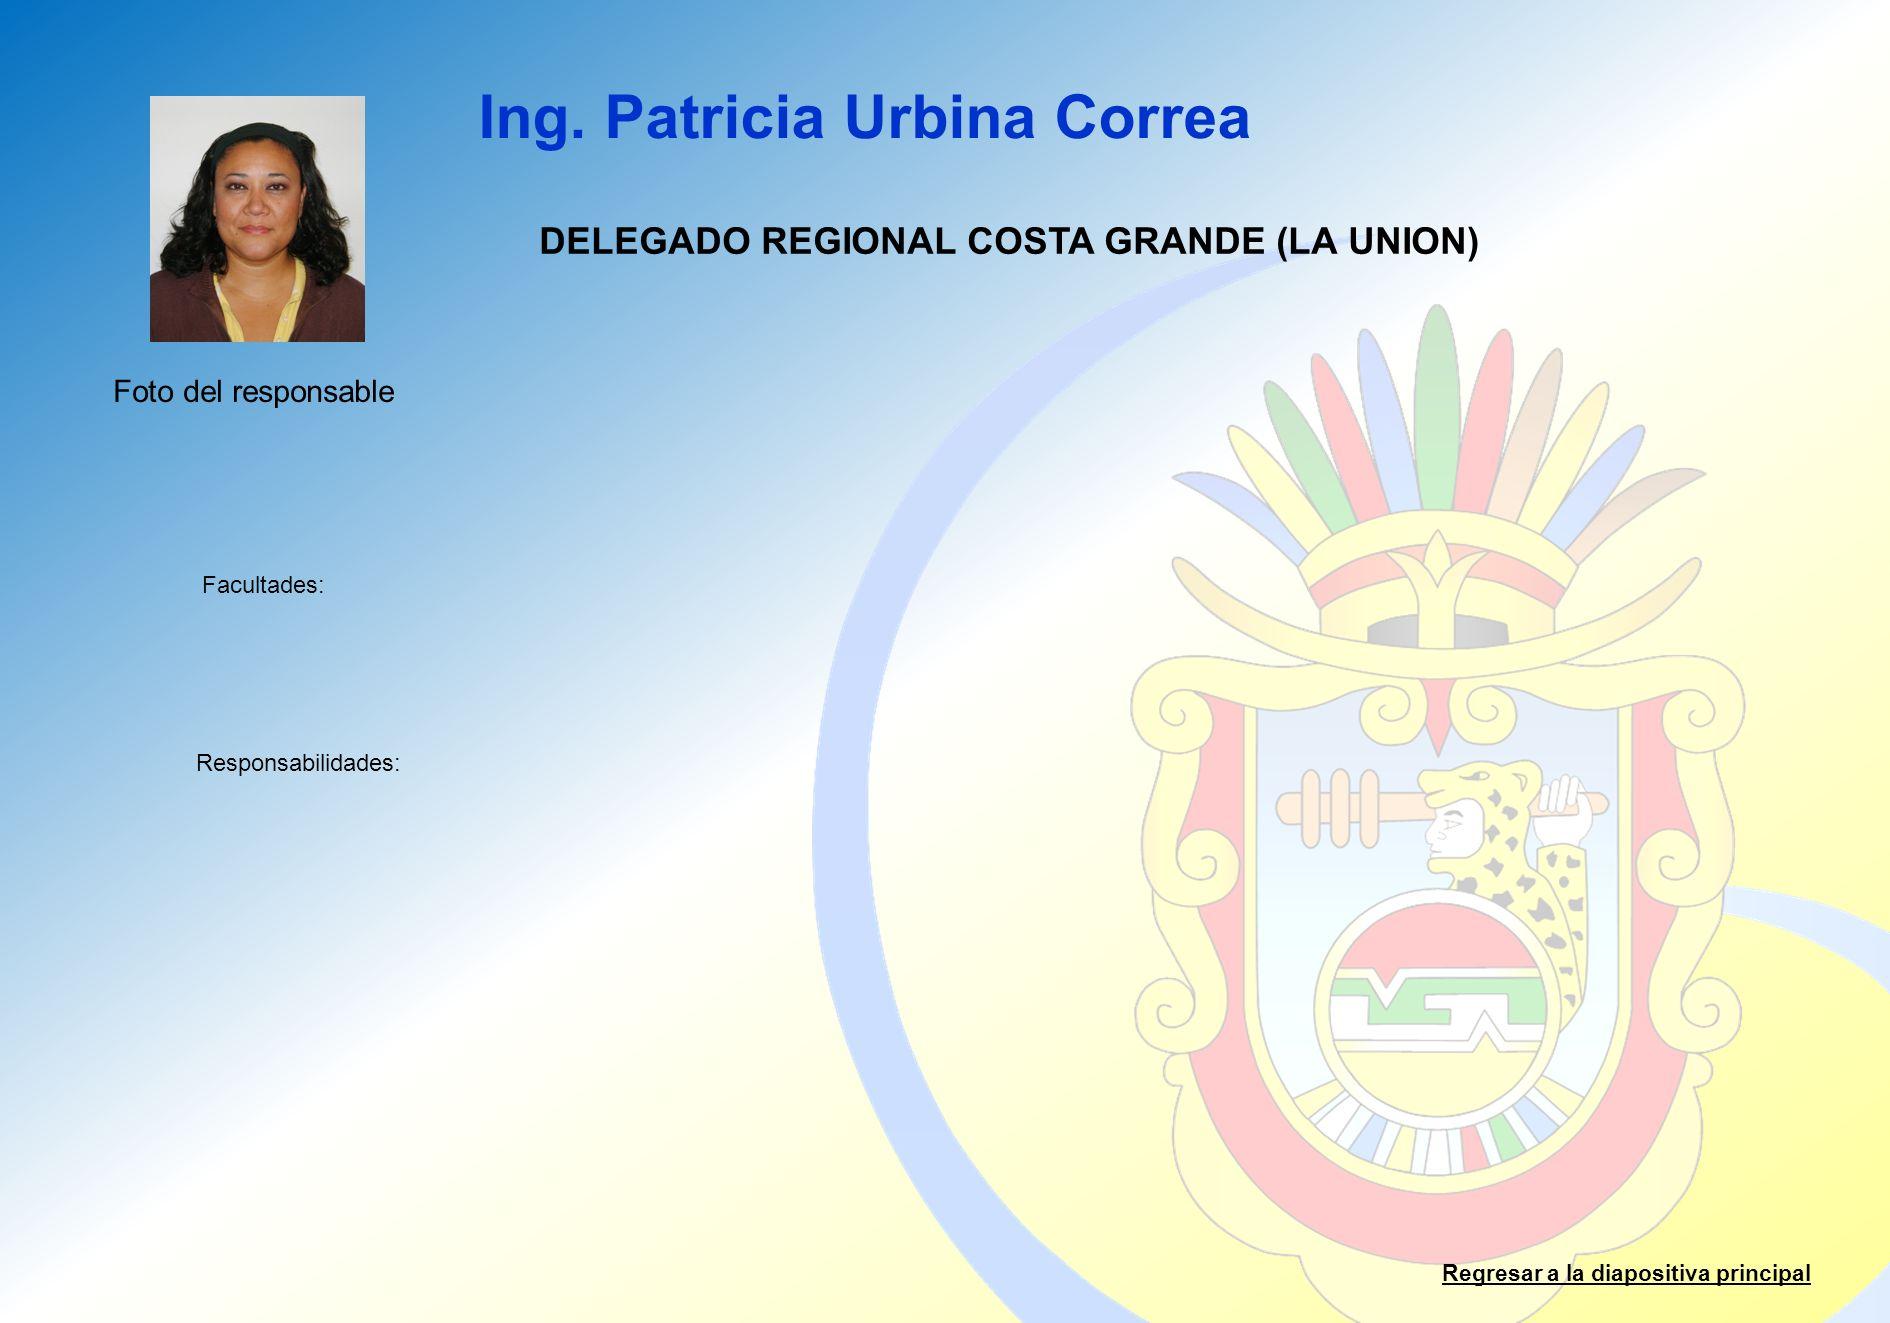 DELEGADO REGIONAL COSTA GRANDE (LA UNION)